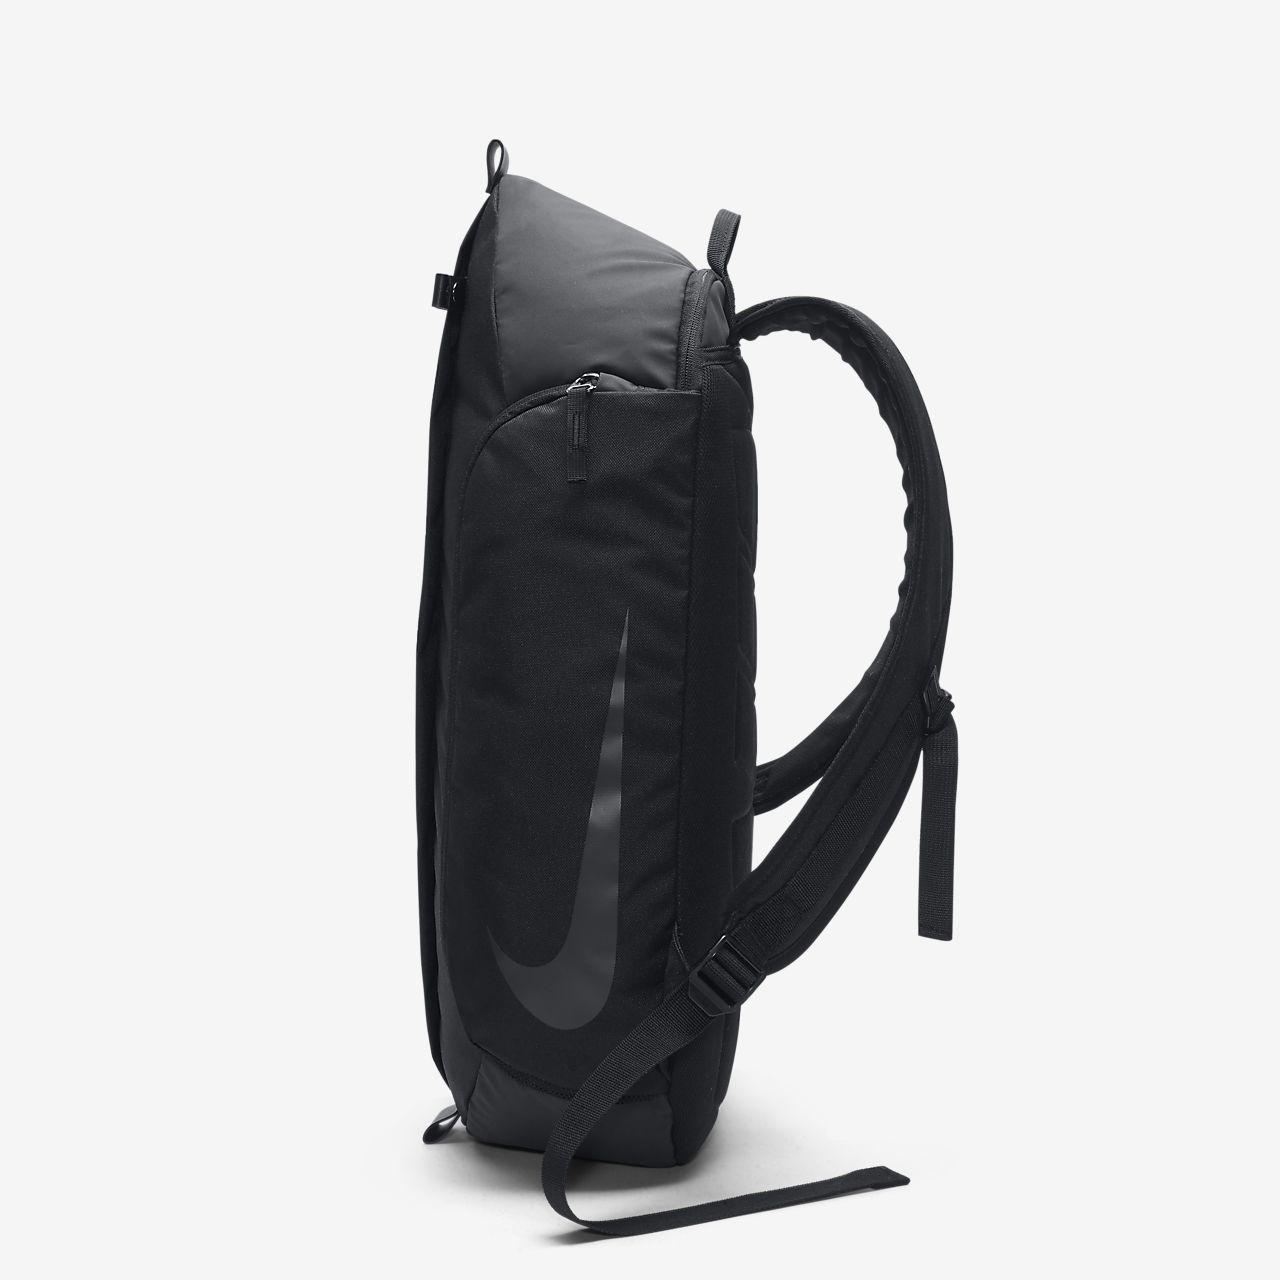 ea492fc1a3b2 Nike FB Centerline Football Backpack. Nike.com GB